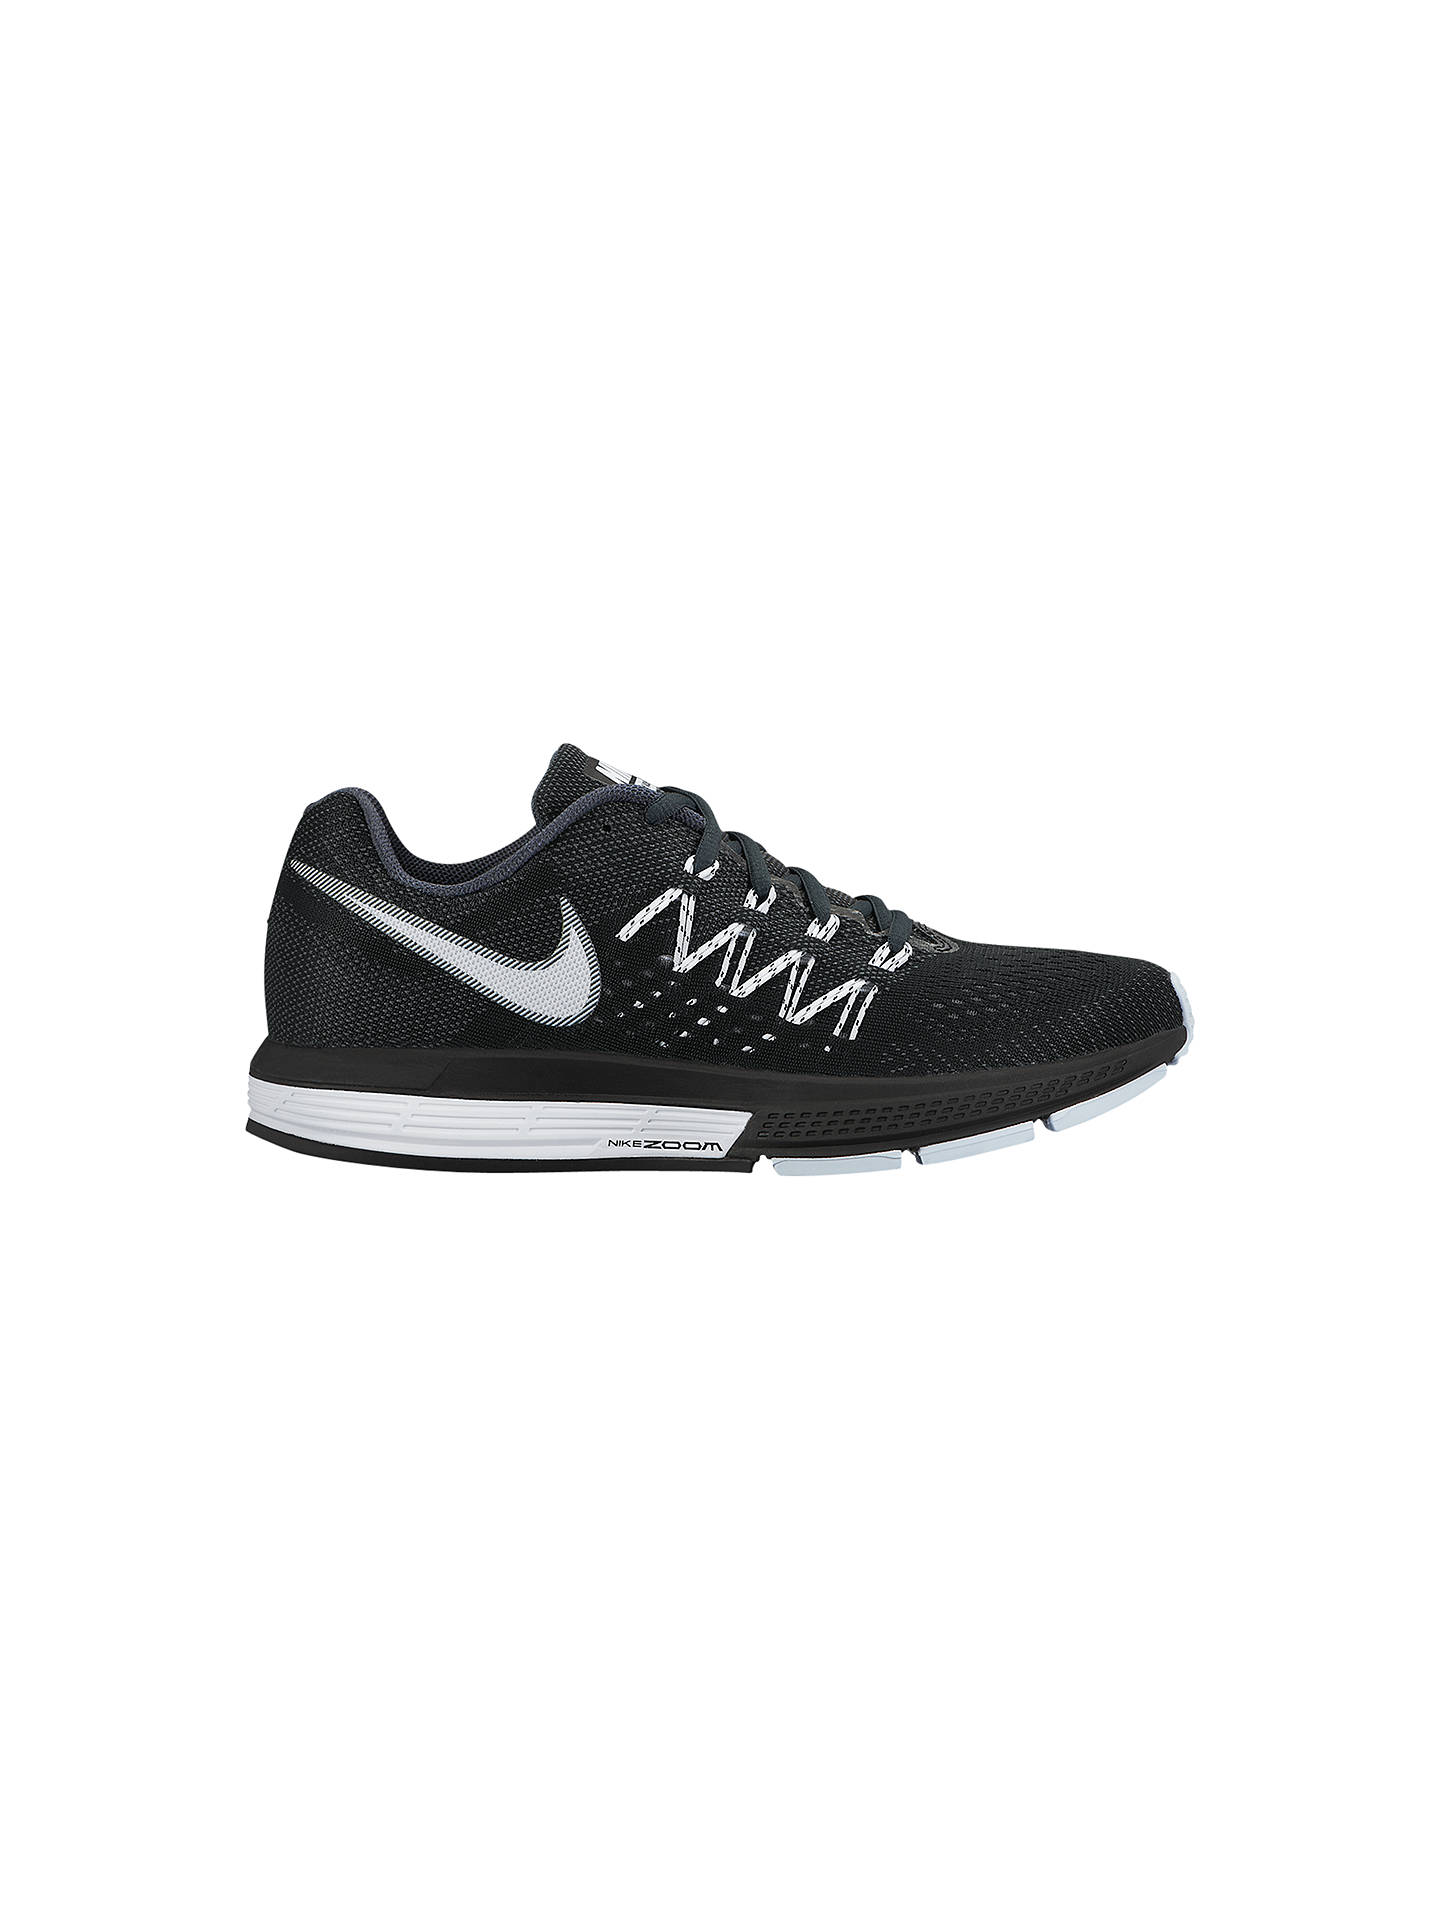 da3478257246 Buy Nike Air Zoom Vomero 10 Women s Running Shoes